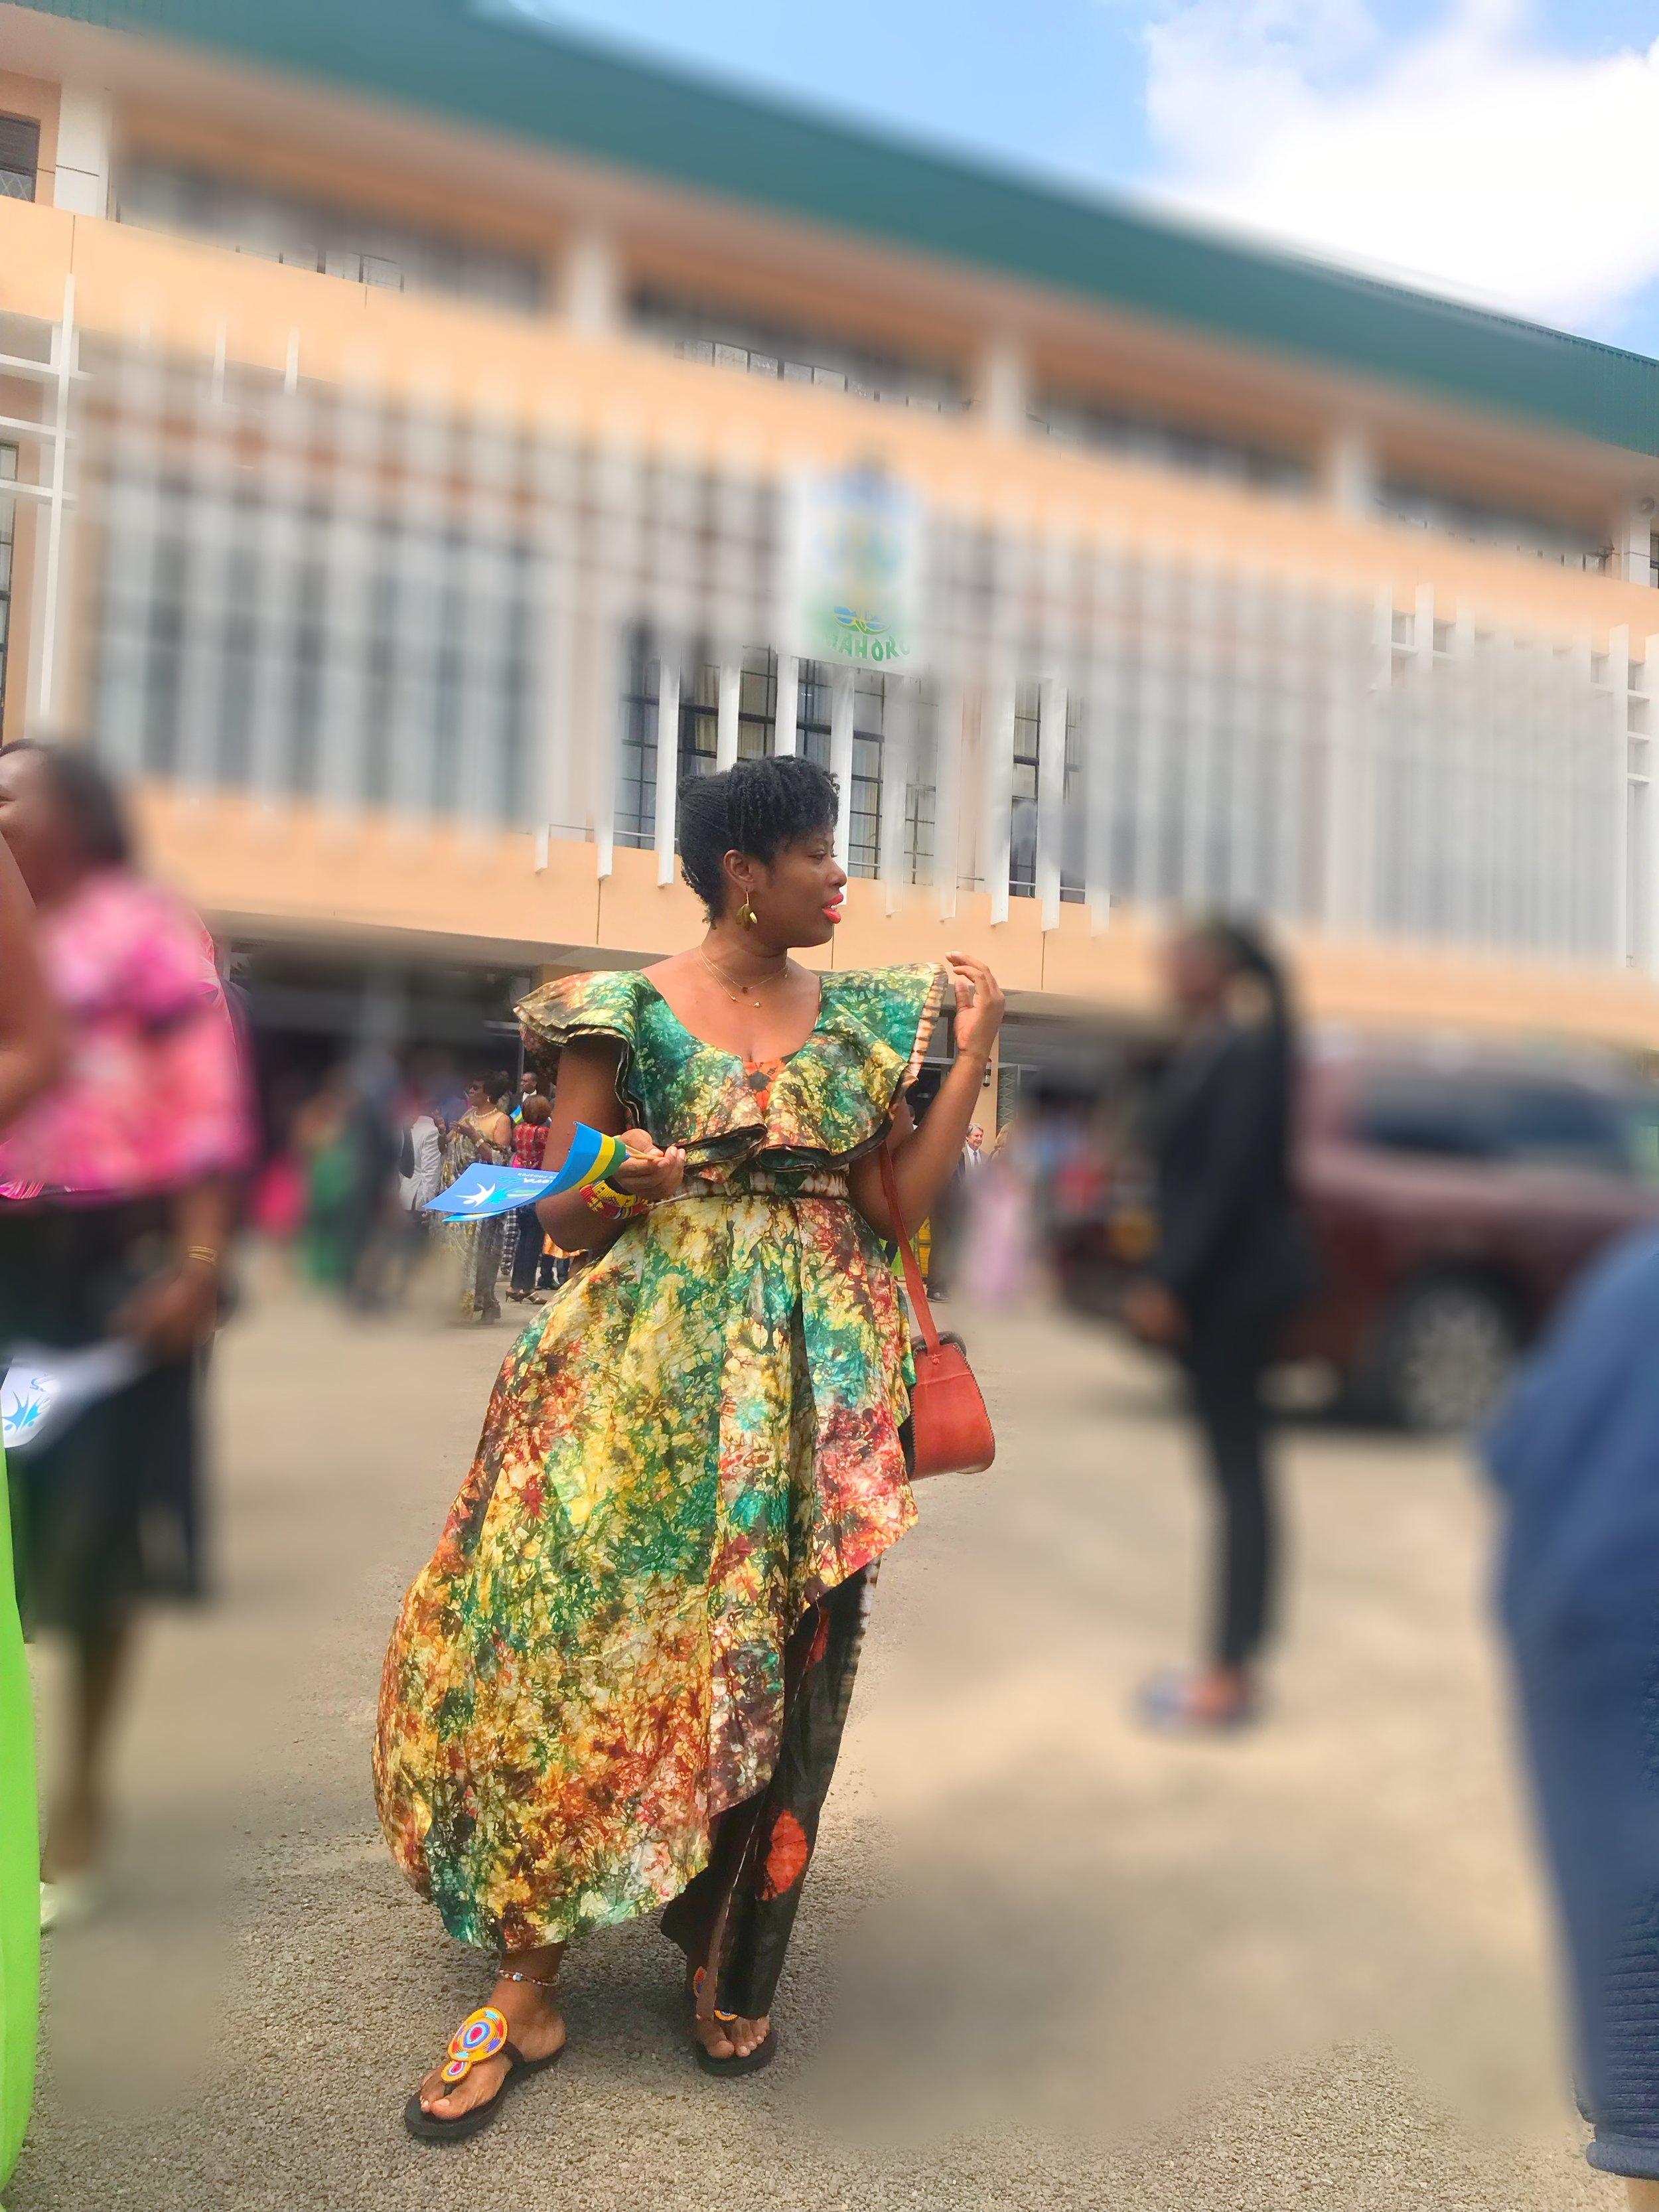 IMG_5889_Facetune_04-07-2019-21-11-19VickieRemoe-travel-kigali-rwanda-review-kwibohora25-hotels-africa.JPG